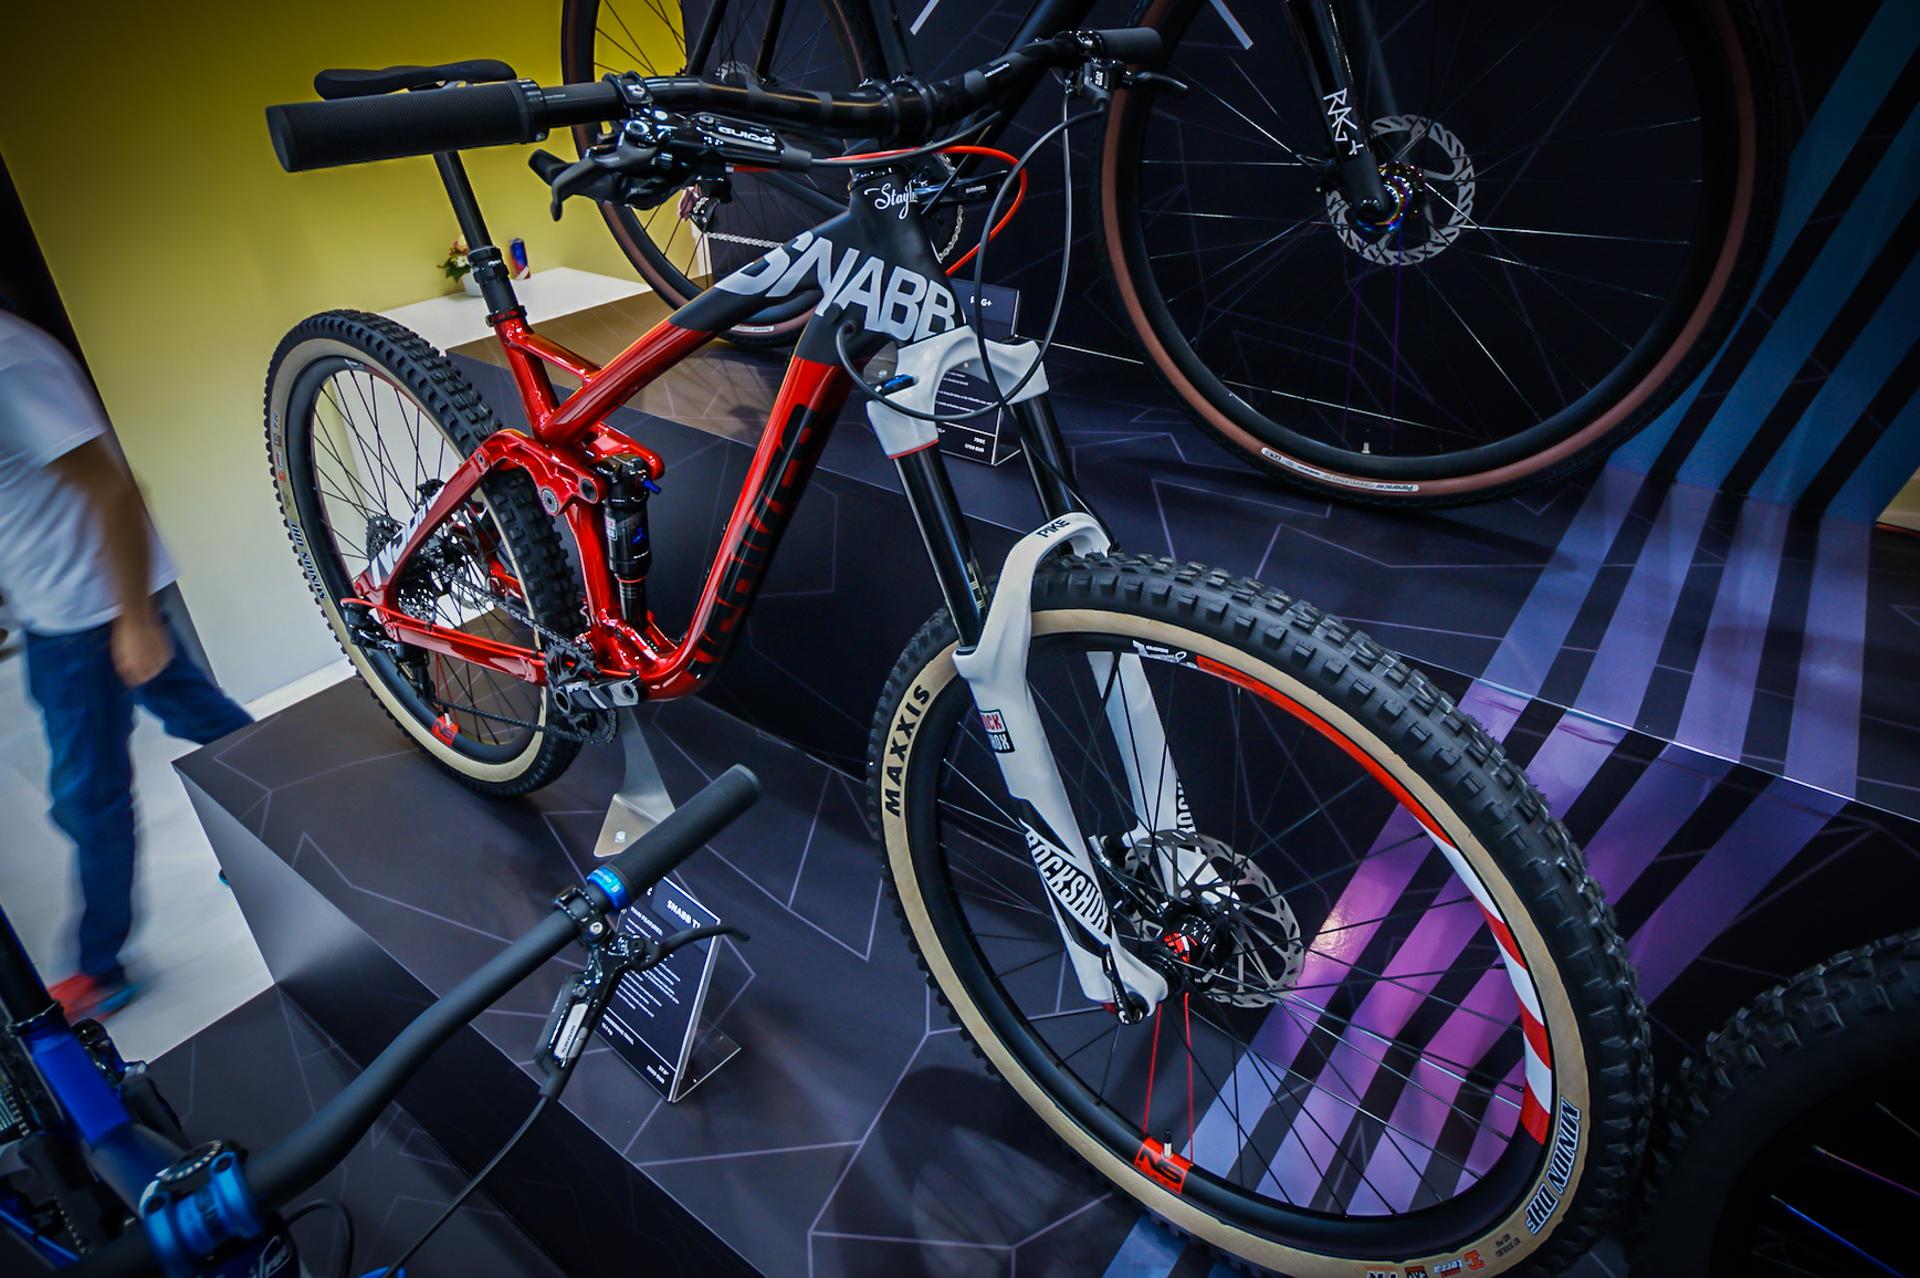 Kolejna cudna maszyna - NS Bikes Snabb T1.